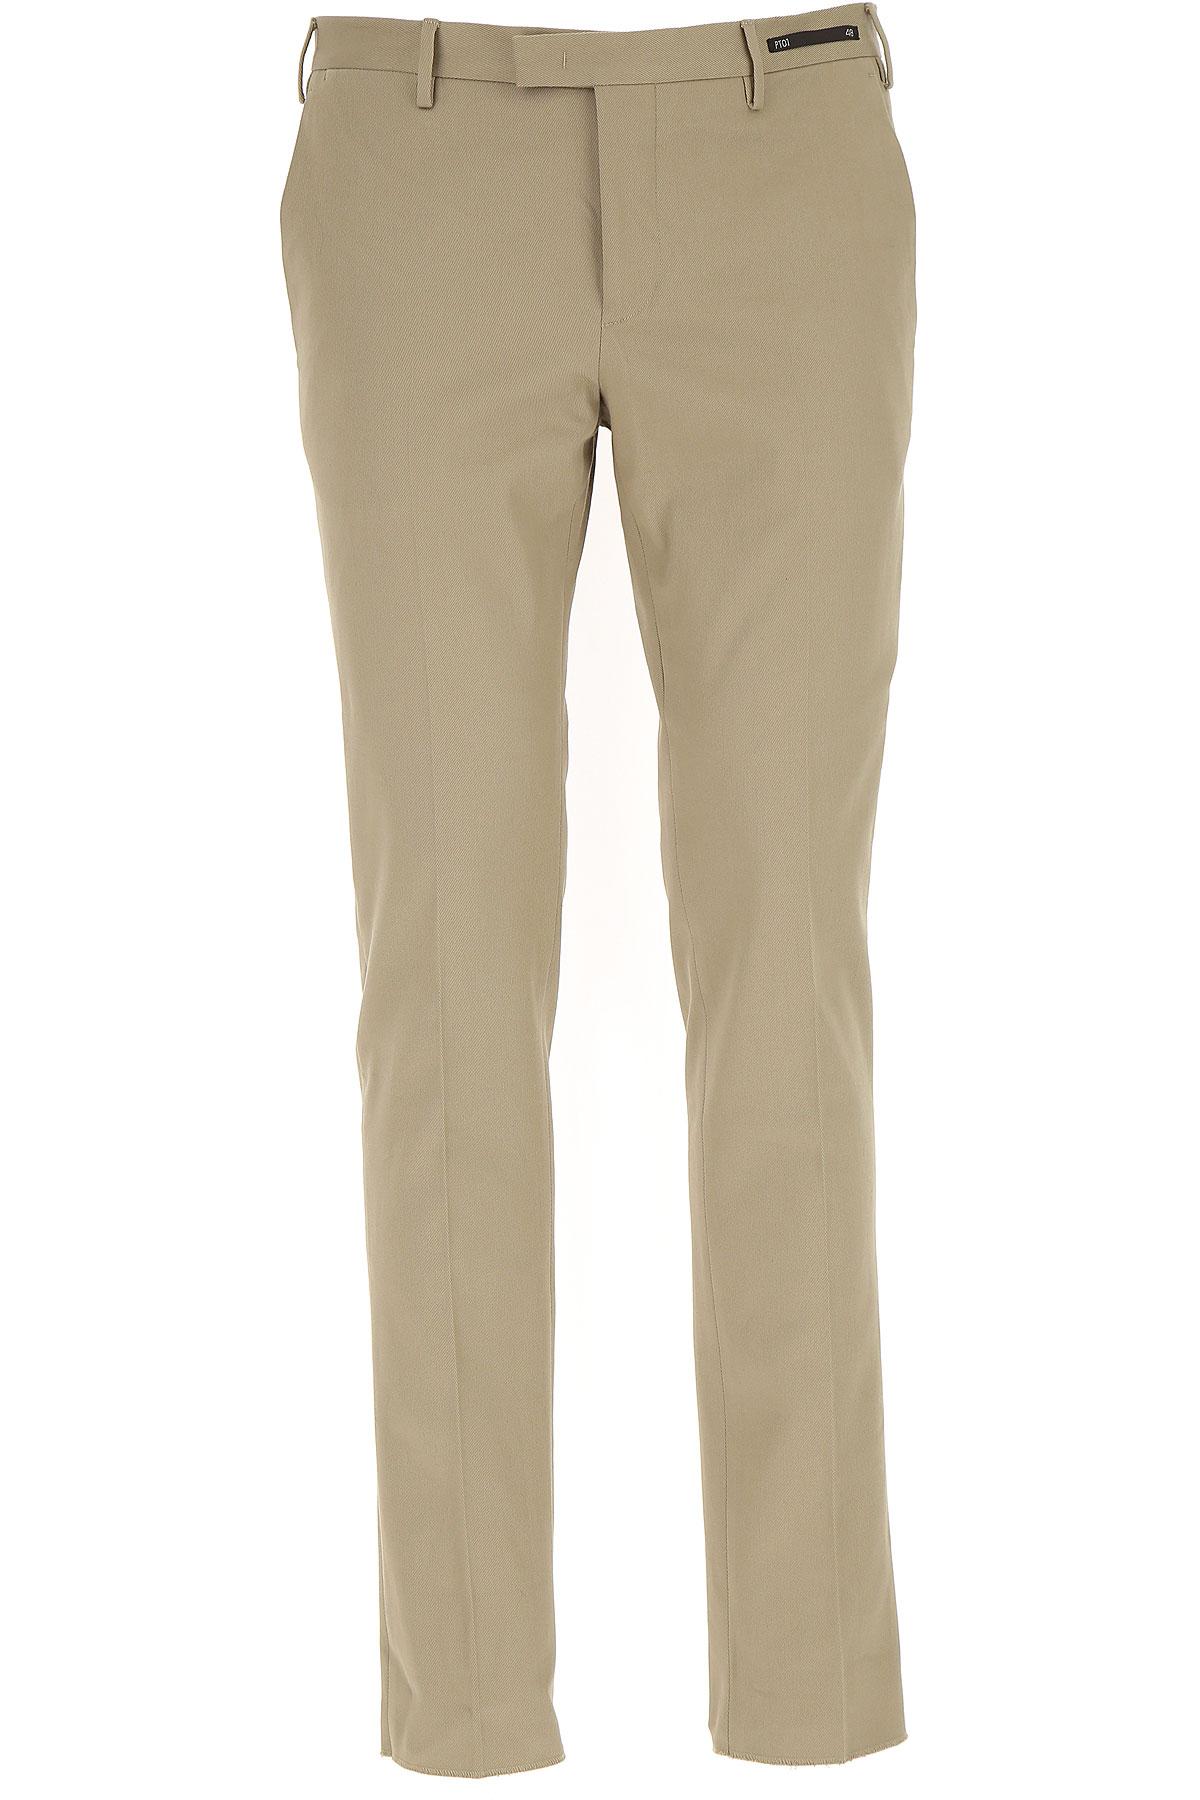 Image of PT01 Pants for Men, Beige, Cotton, 2017, 31 32 33 34